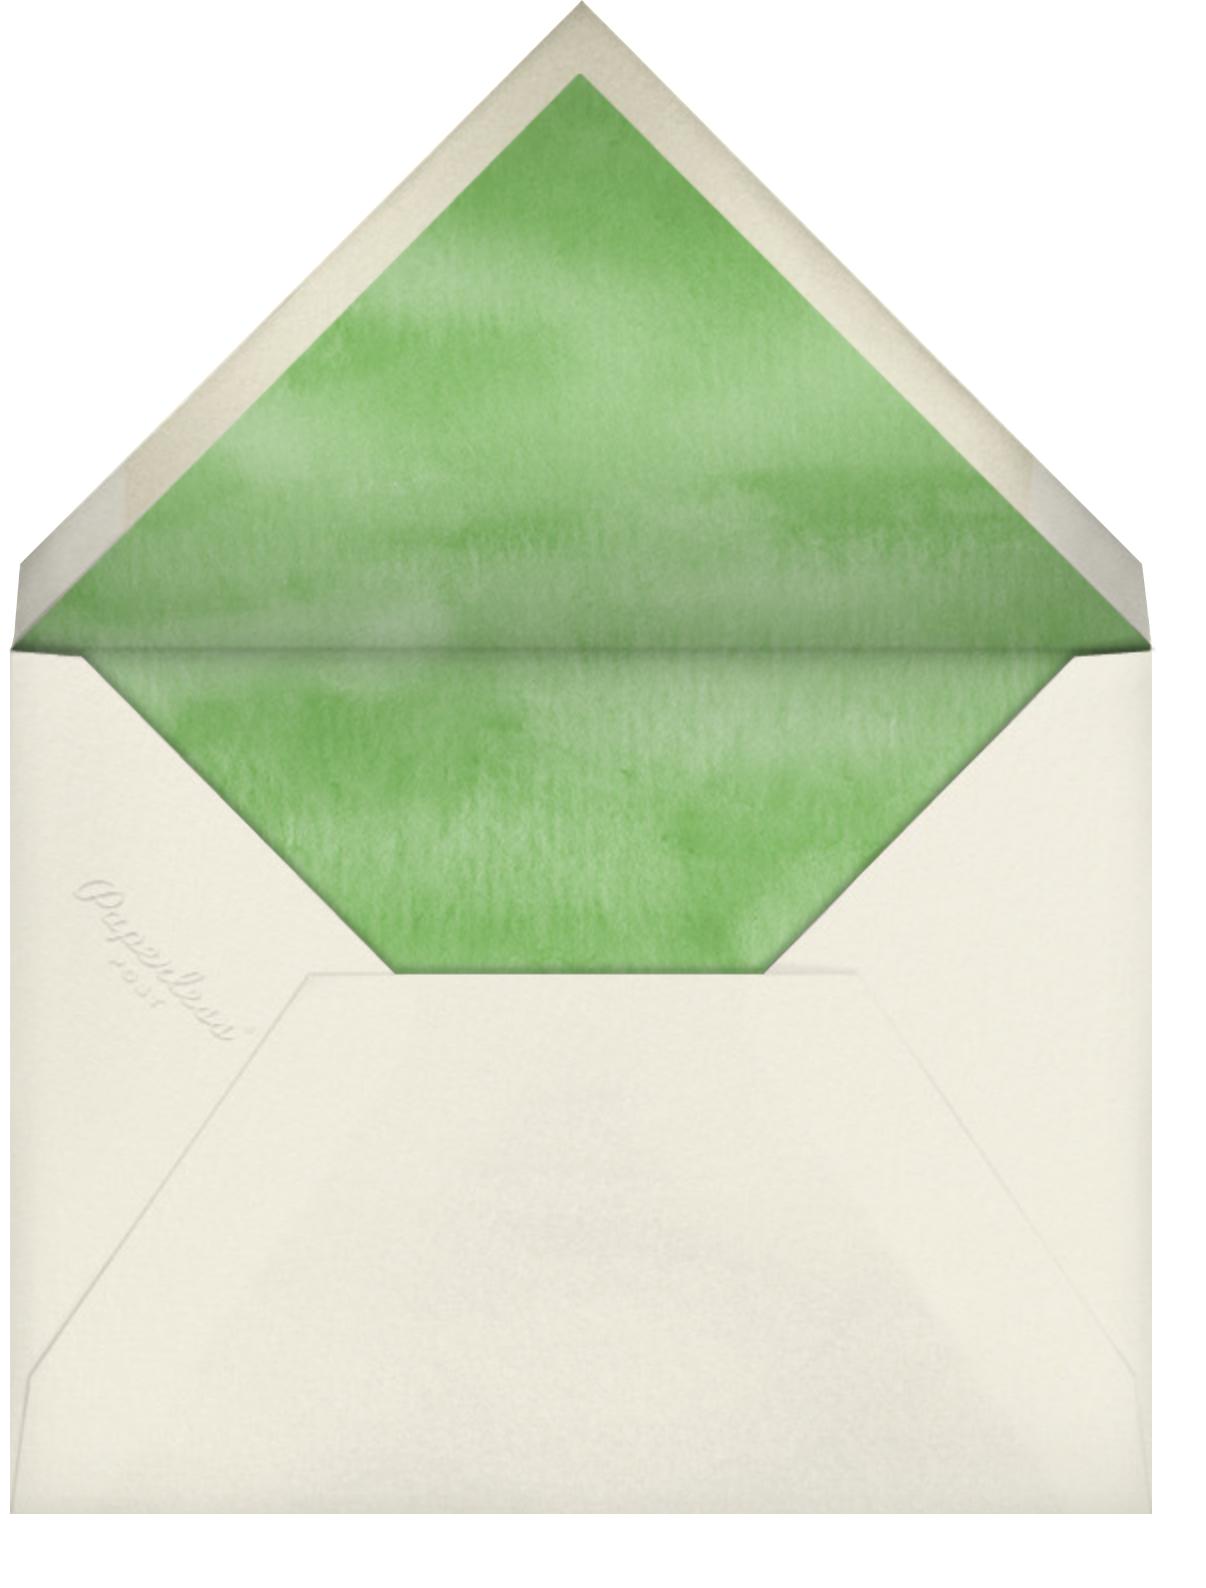 Eureka Bower - Felix Doolittle - General entertaining - envelope back